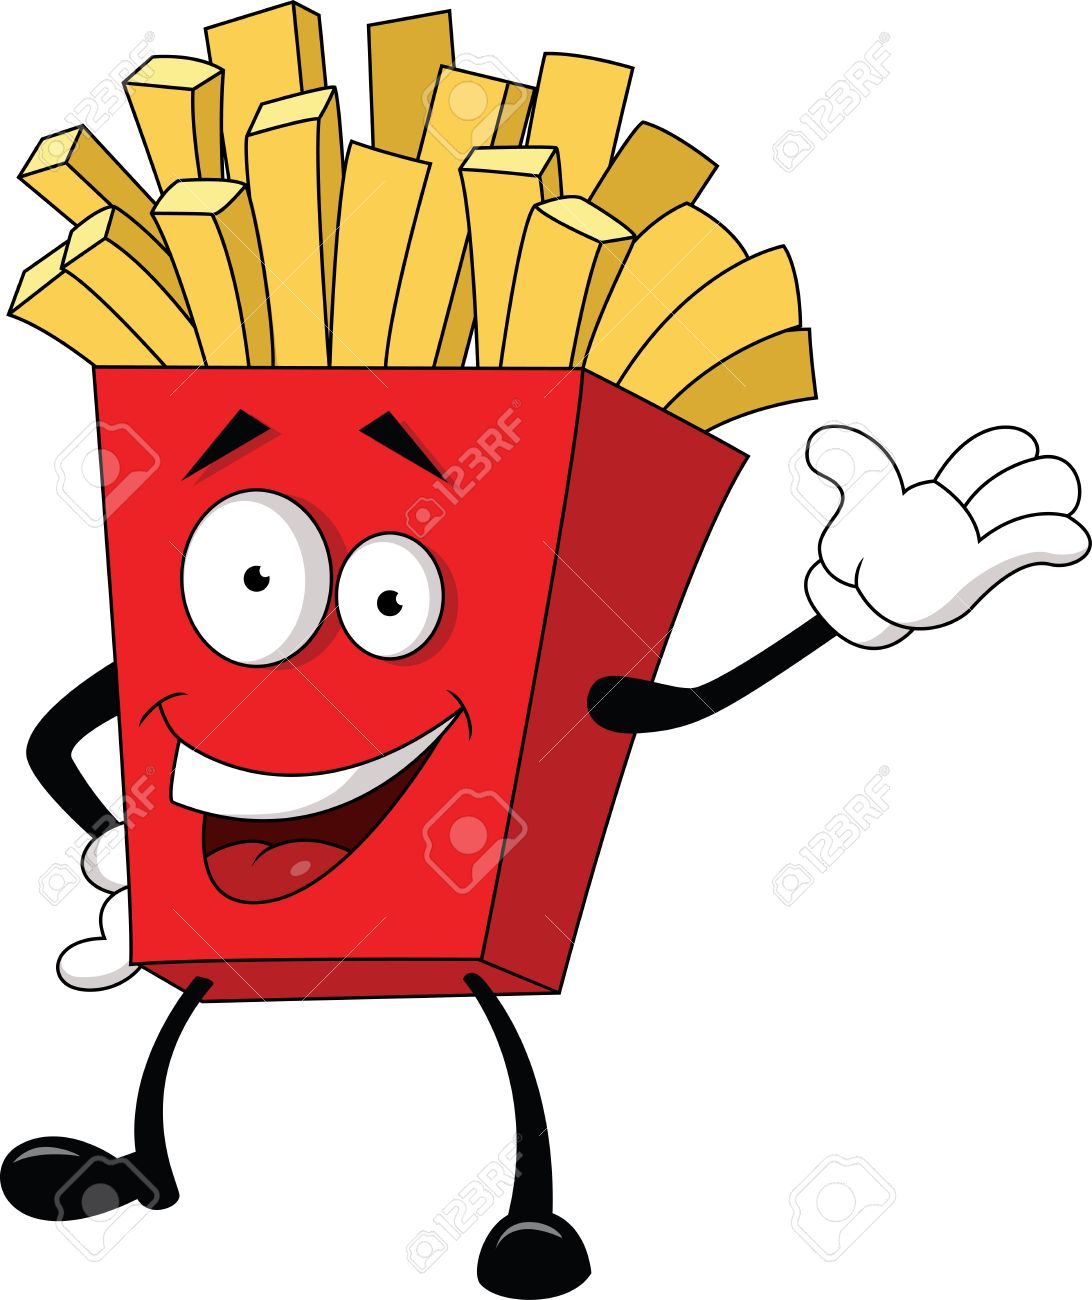 1092x1300 French Fries Clipart Fried Potato